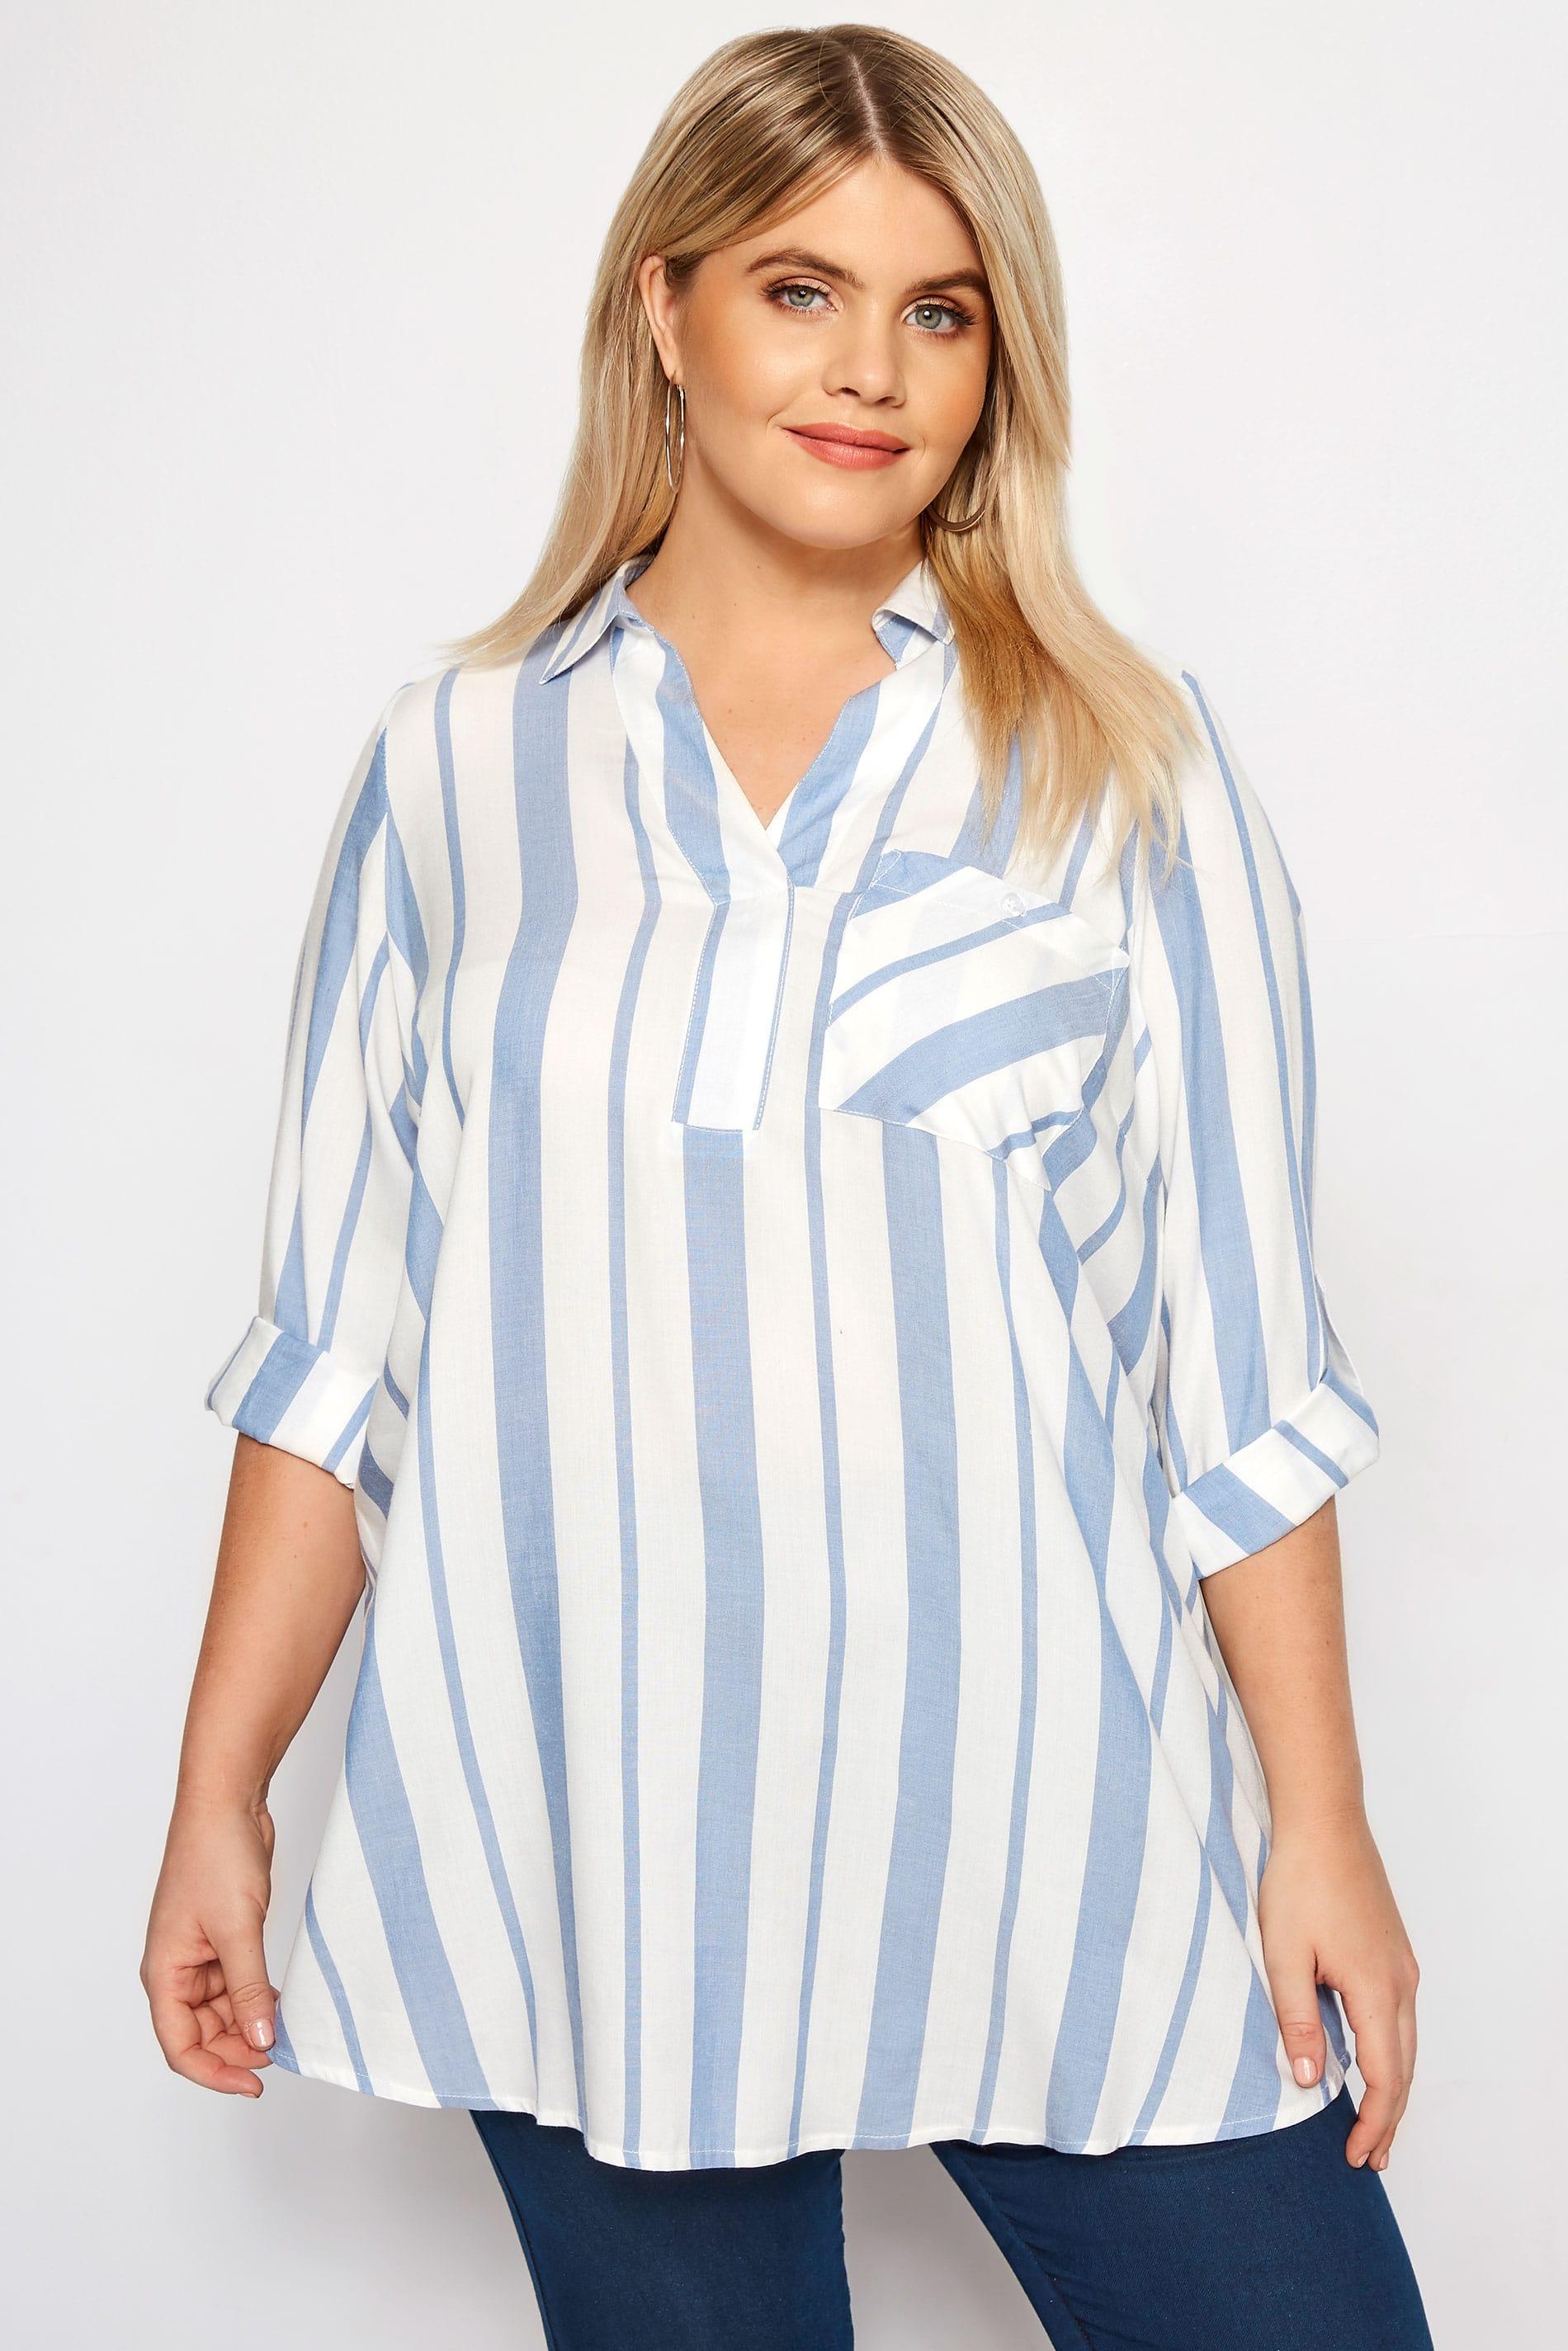 Blue & White Oversized Striped Shirt